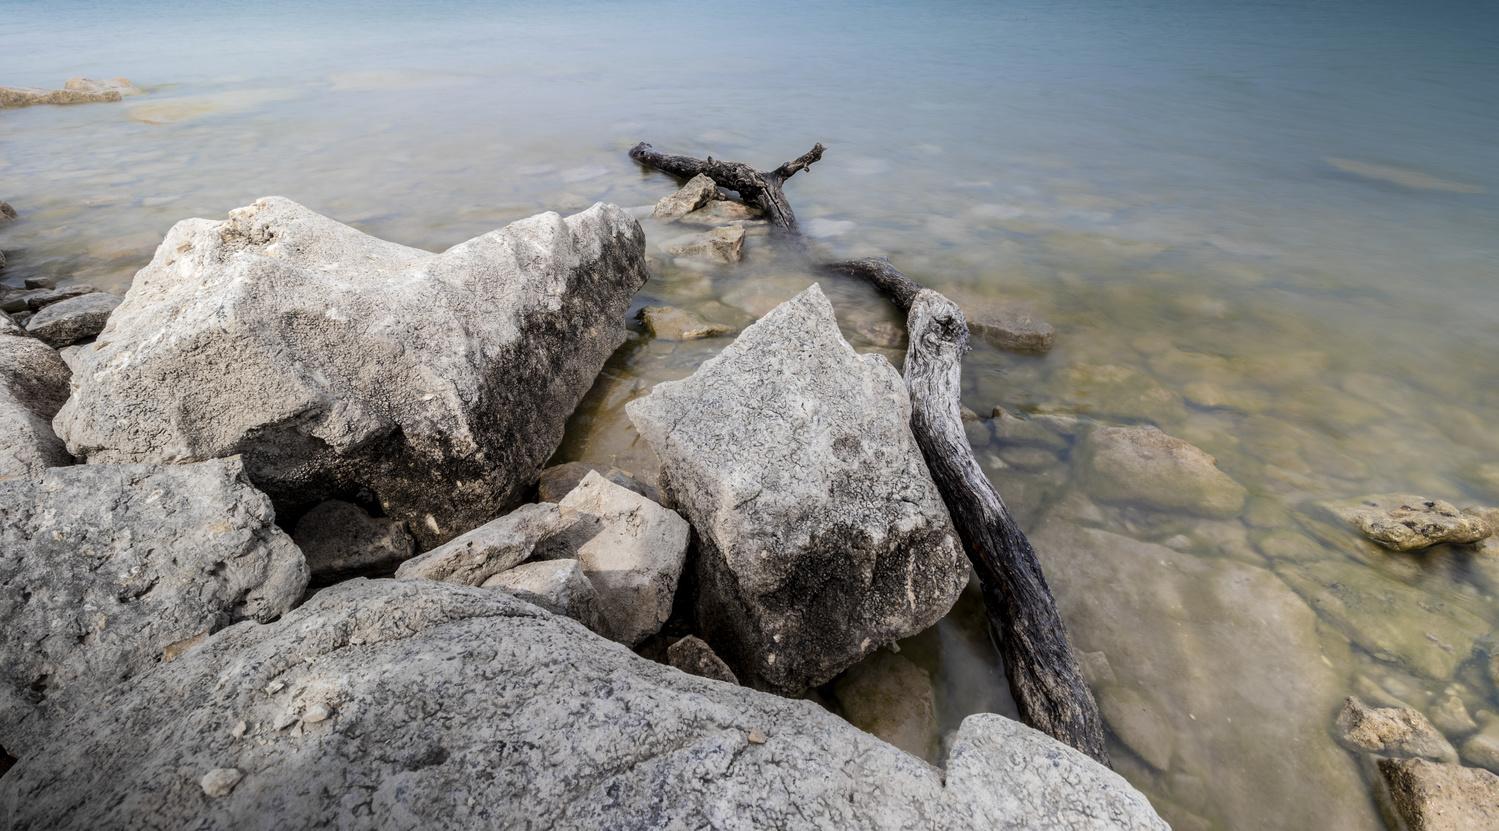 Lake Driftwood by Matt Goudreau